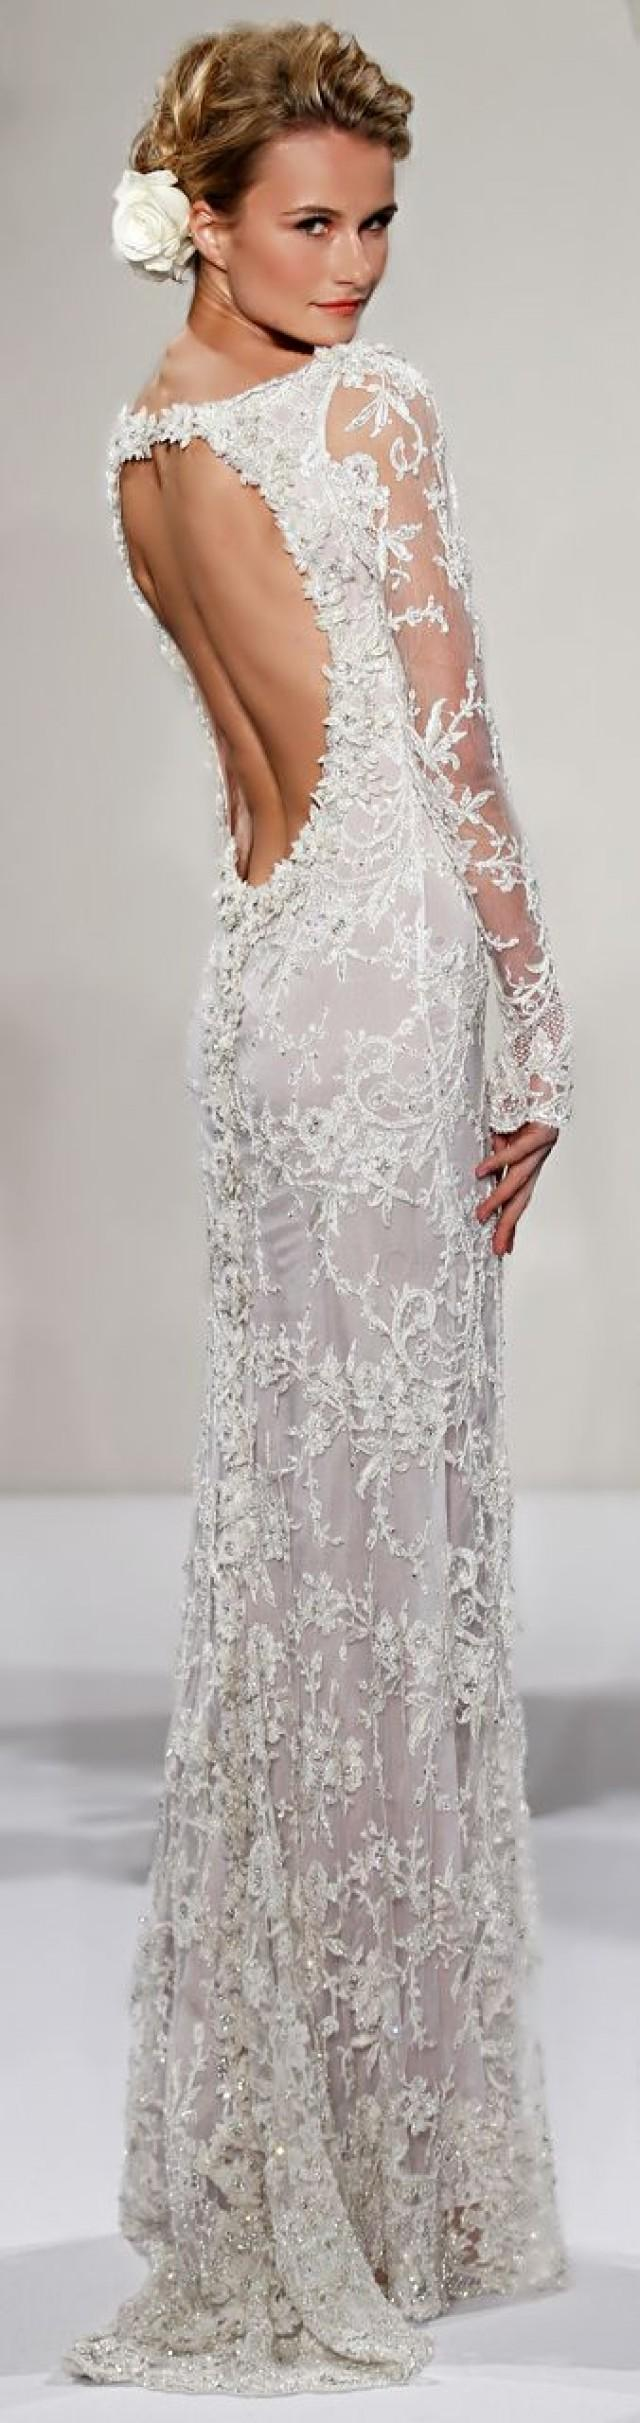 Wedding dresses wedding dress pnina tornai 2026684 for Pnina tornai wedding dresses